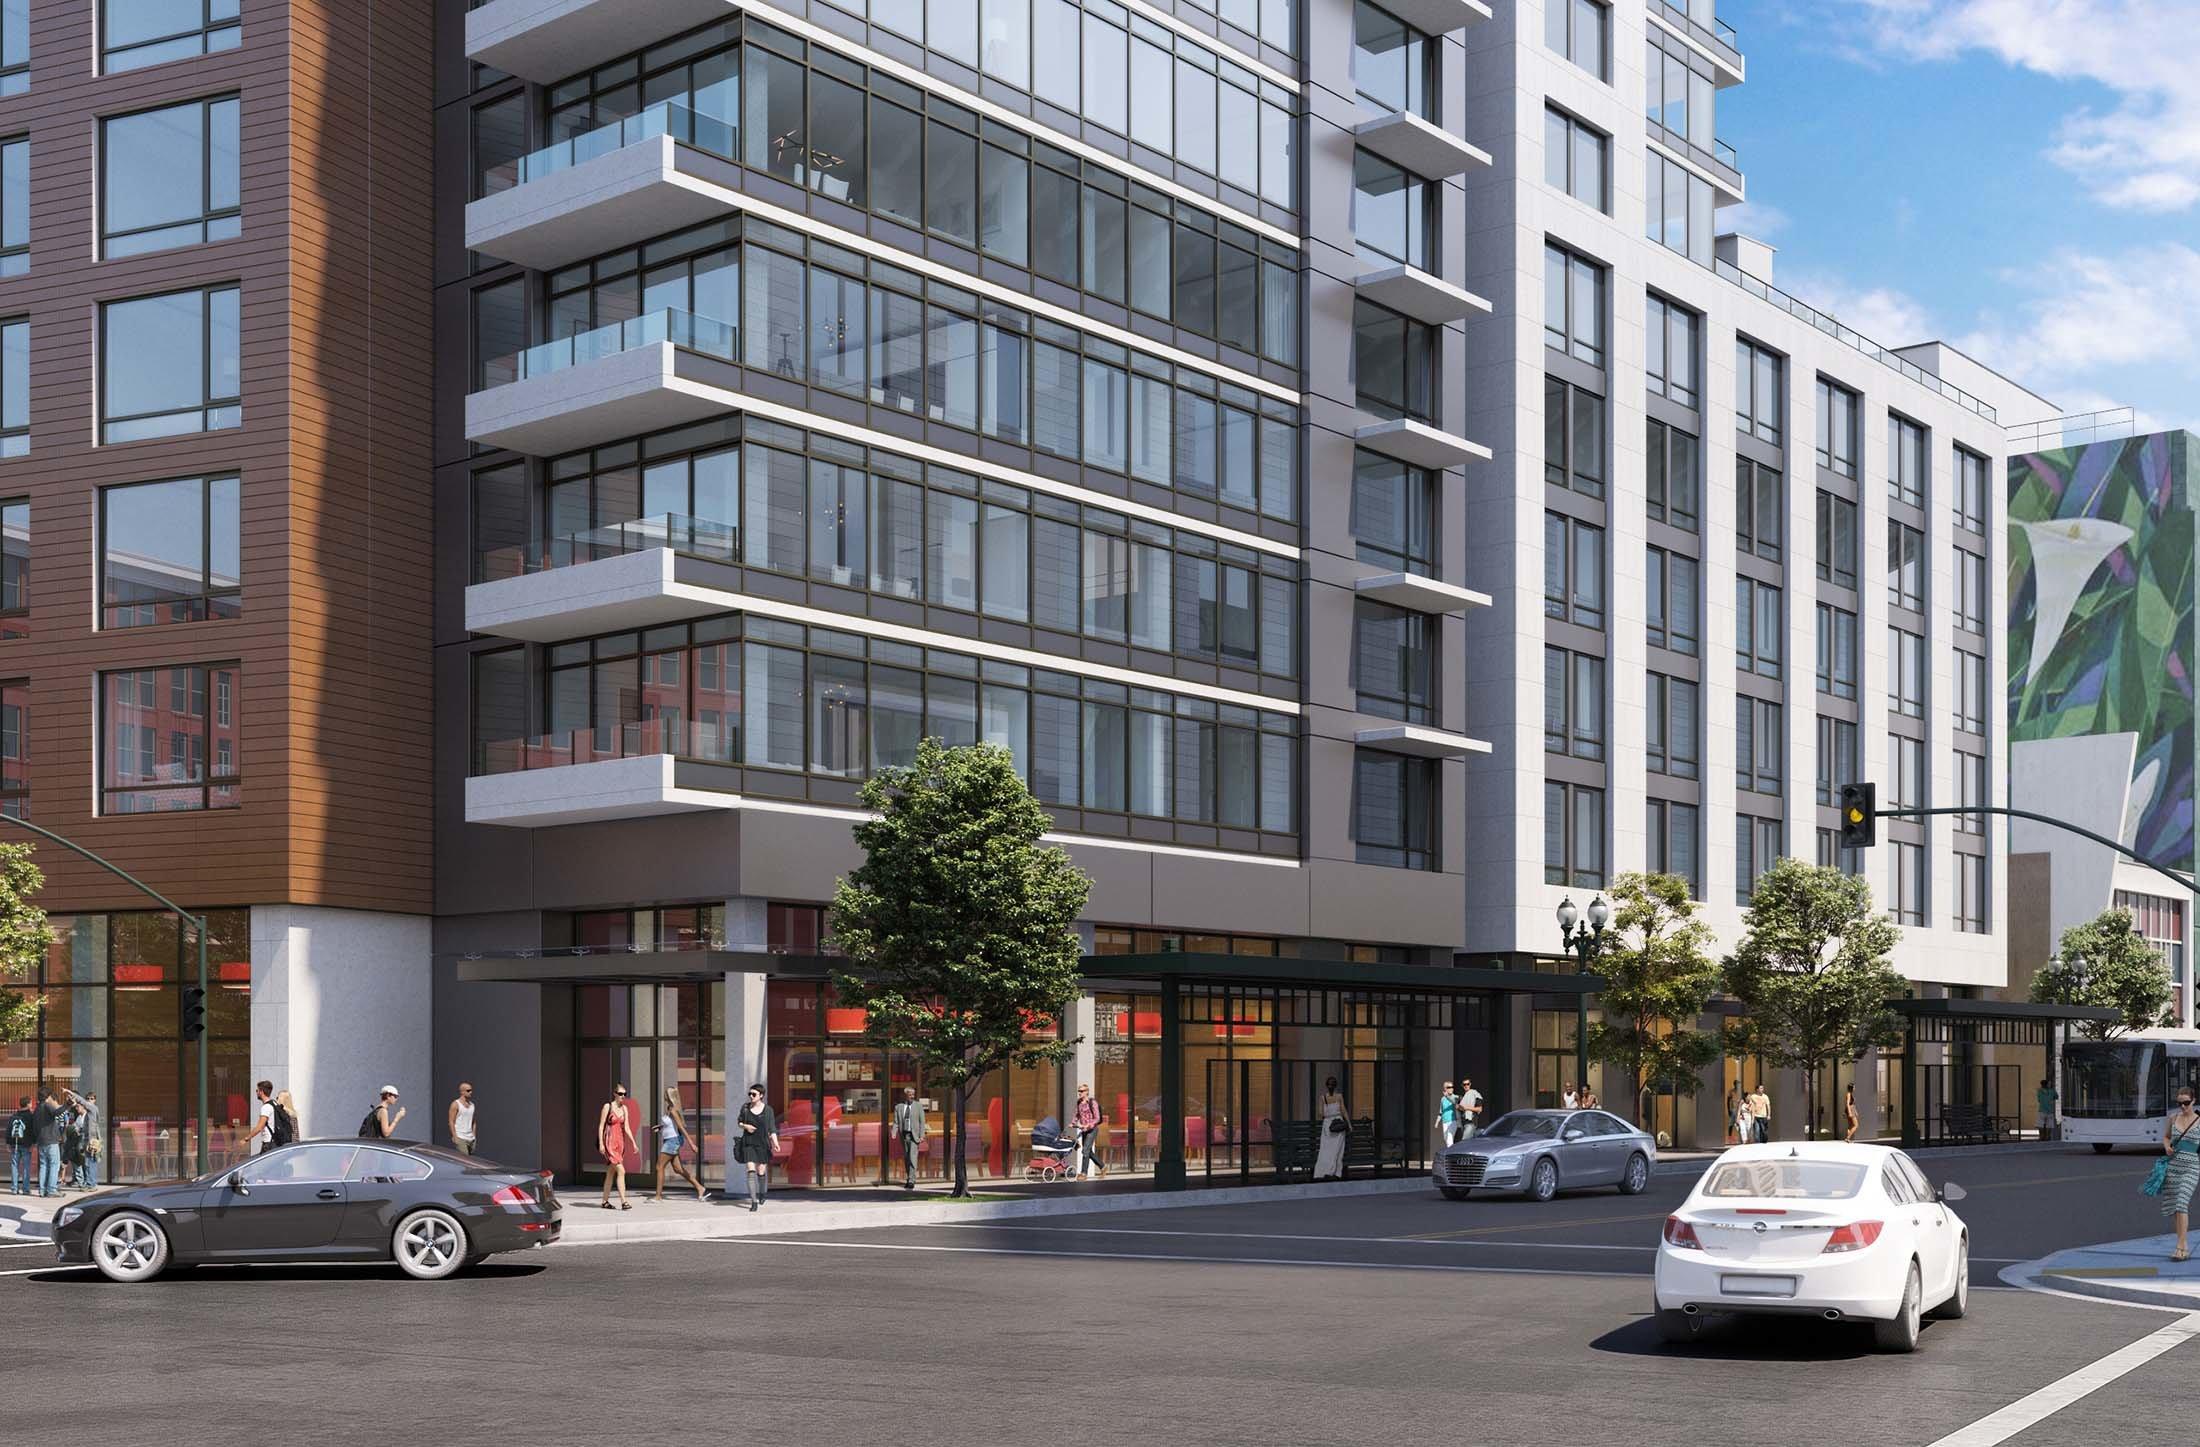 2016 Telegraph Oakland Apartment Building Exterior Design Architecture by brick.